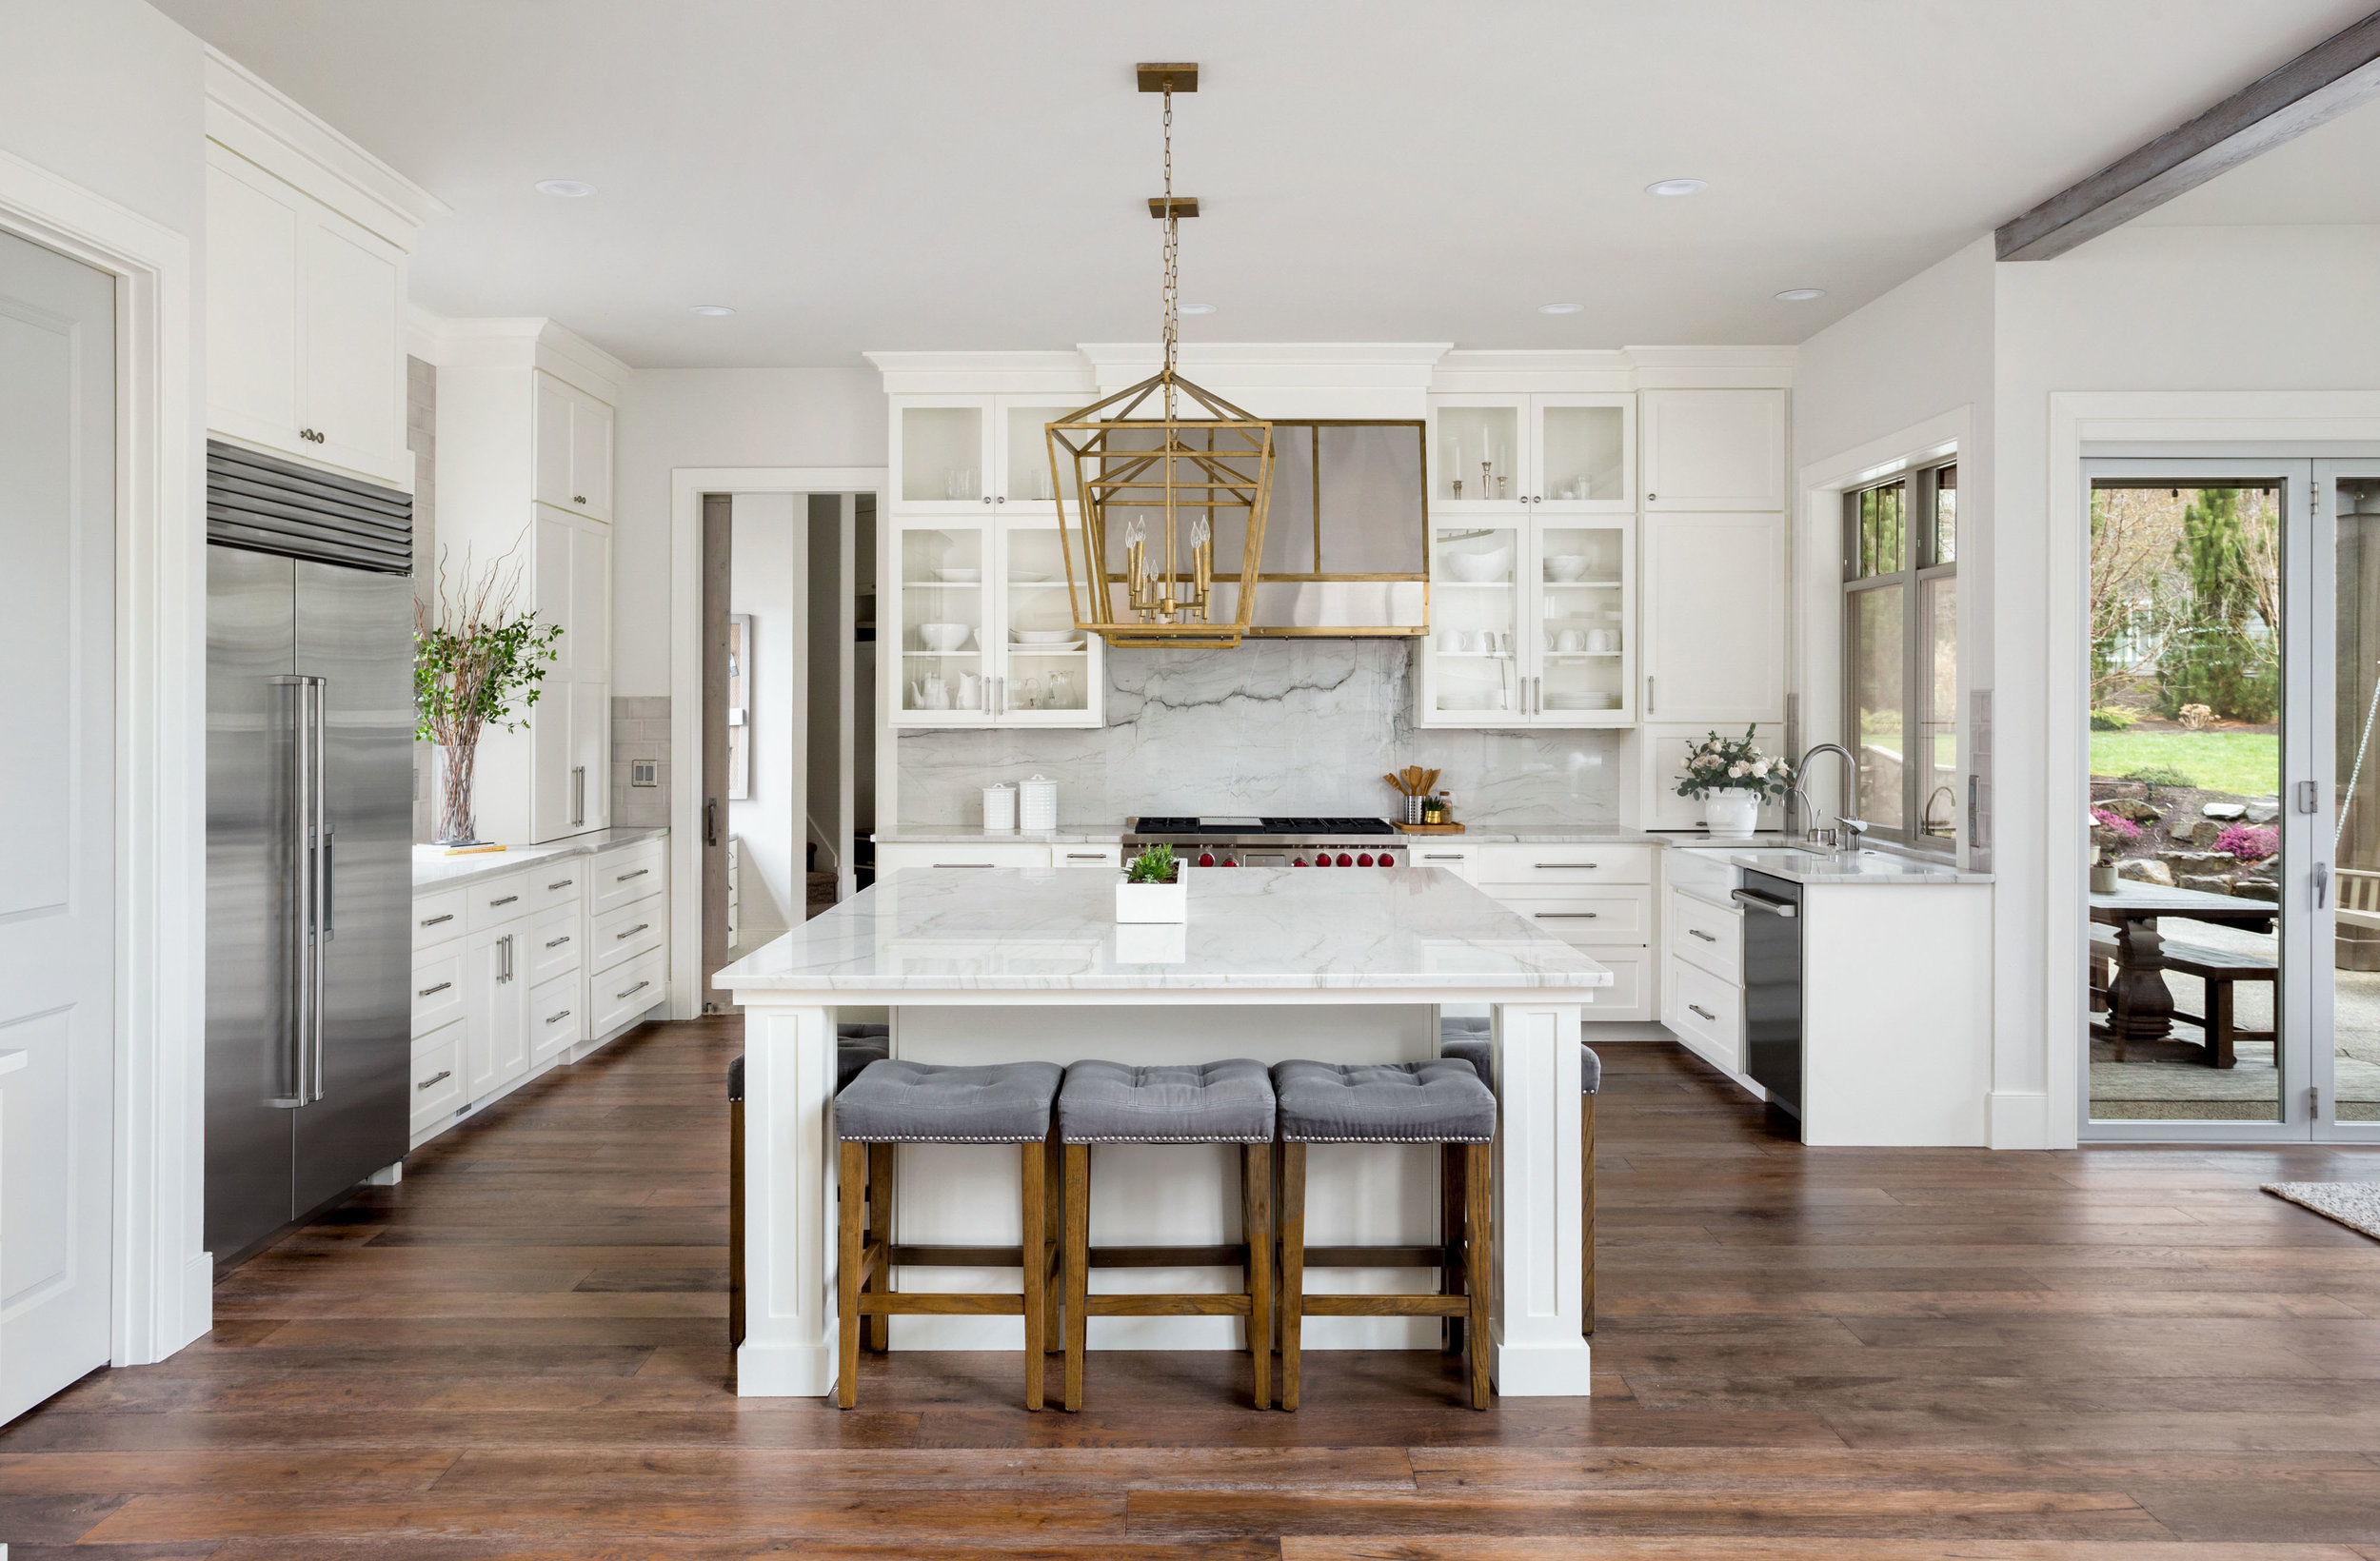 Kitchen-Renovations-1.jpg